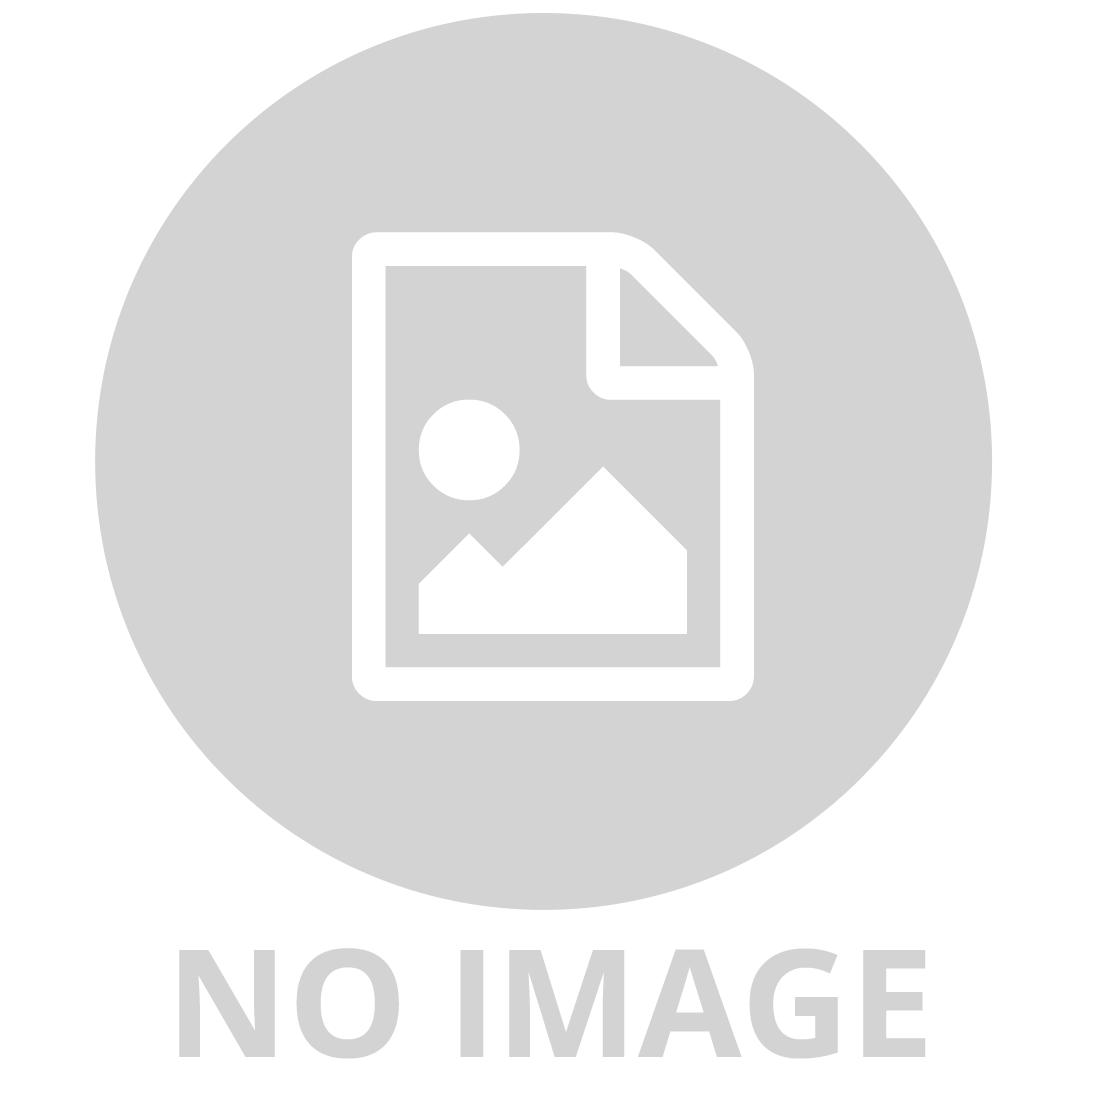 TAMIYA ACRYLIC X 7 RED GLOSS